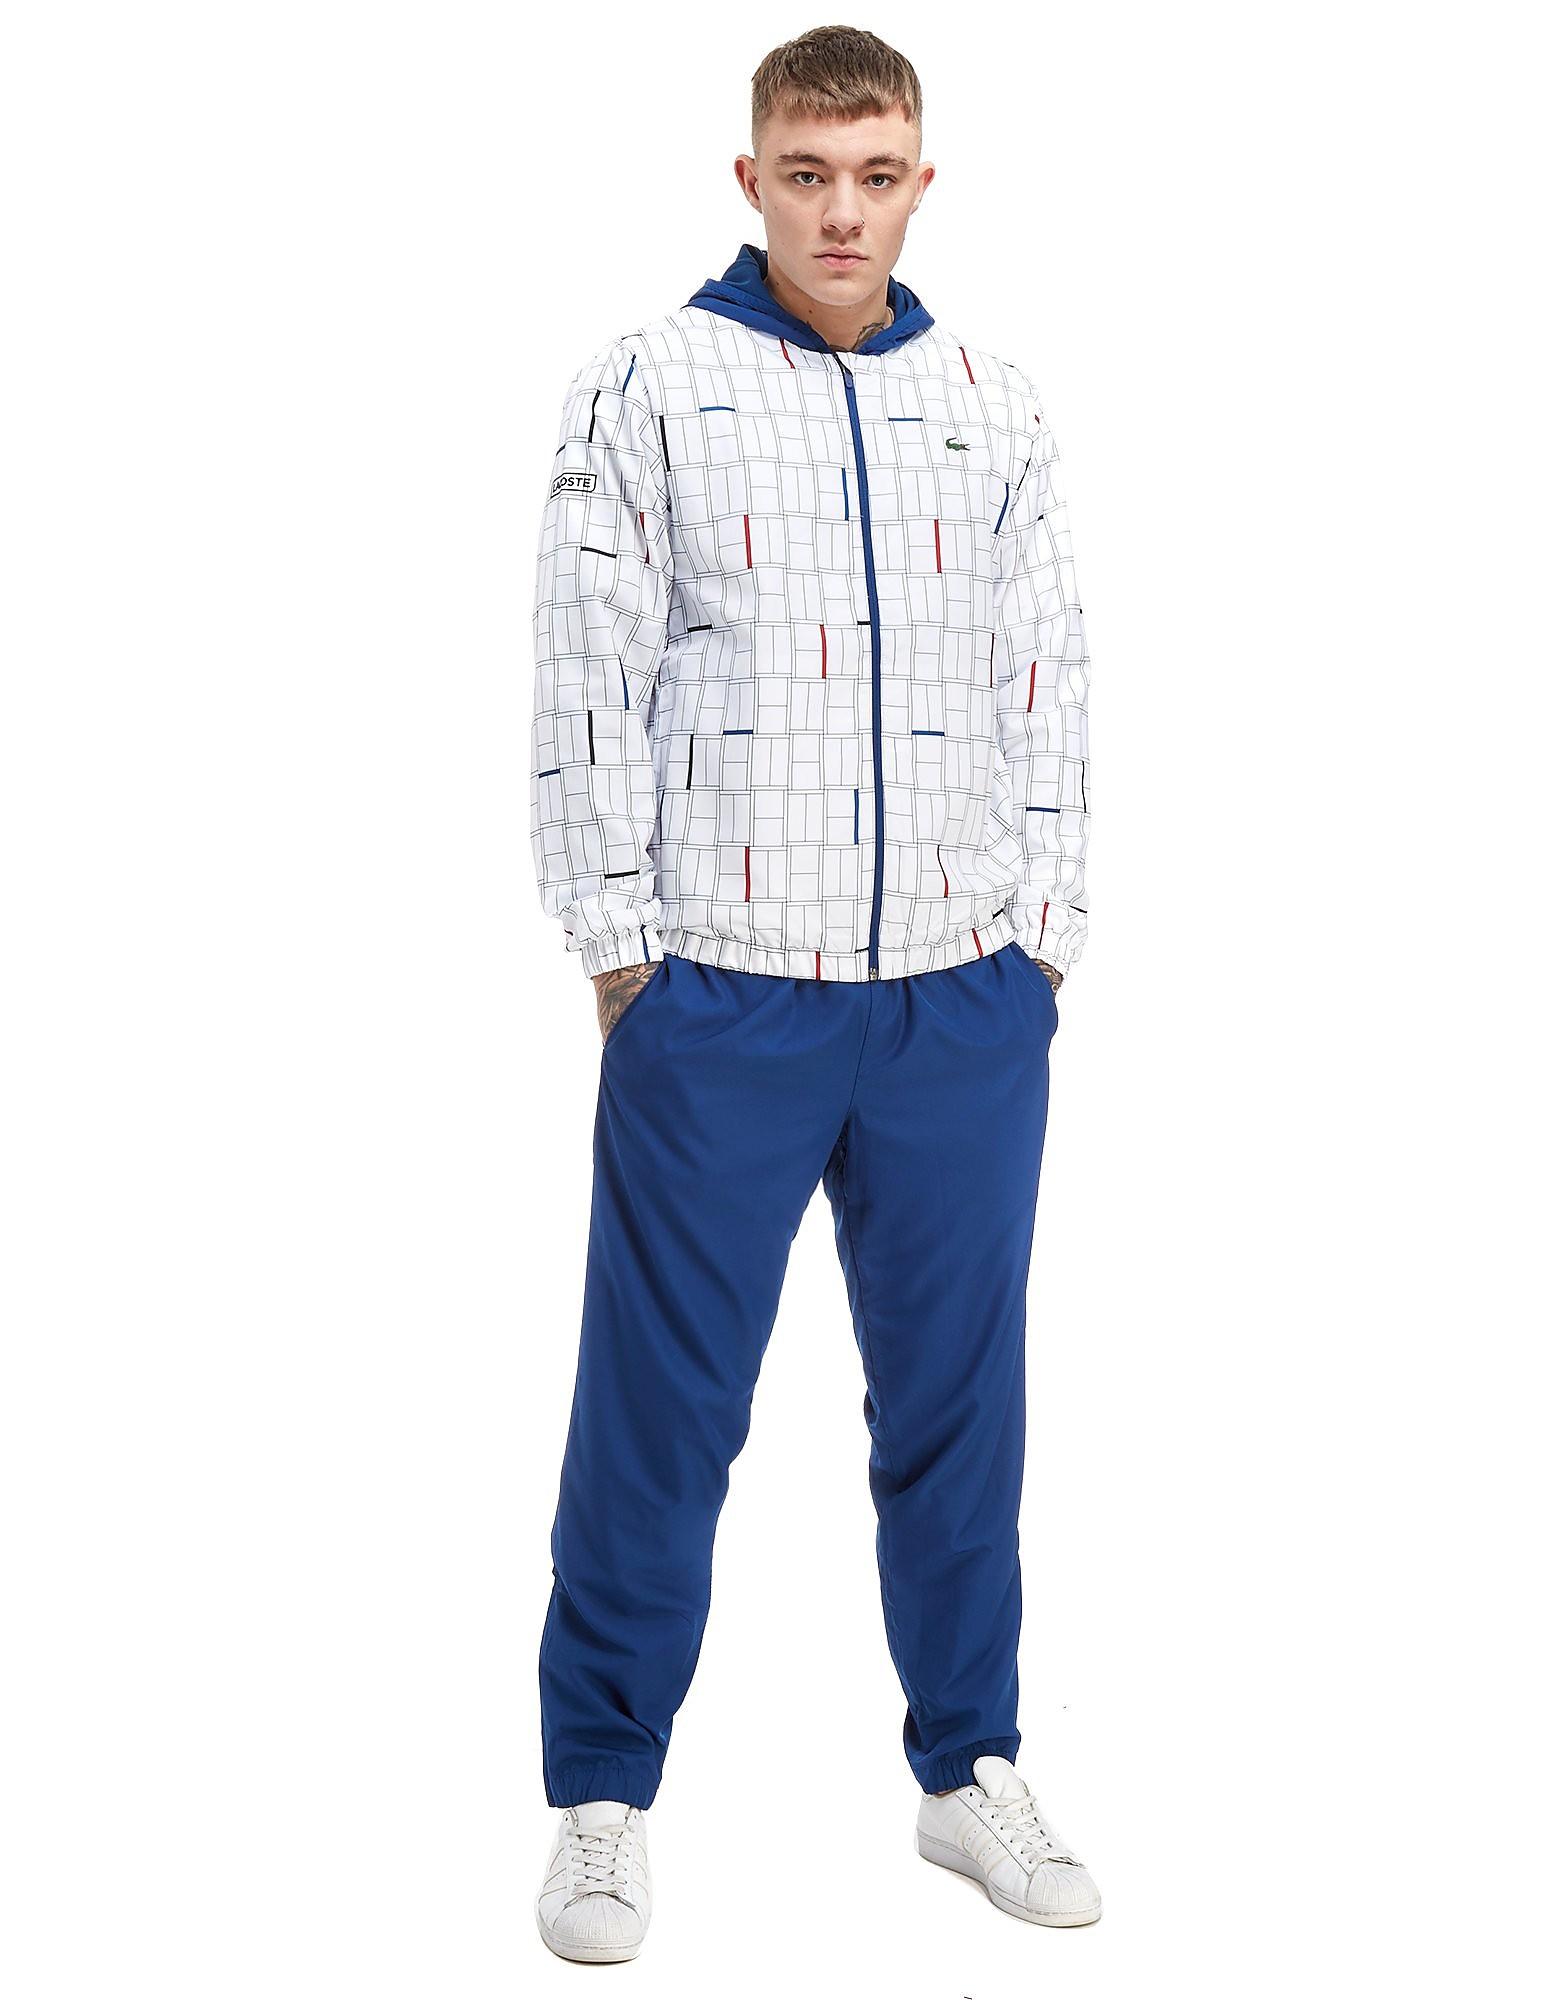 Lacoste Djokovic Grid Check Suit